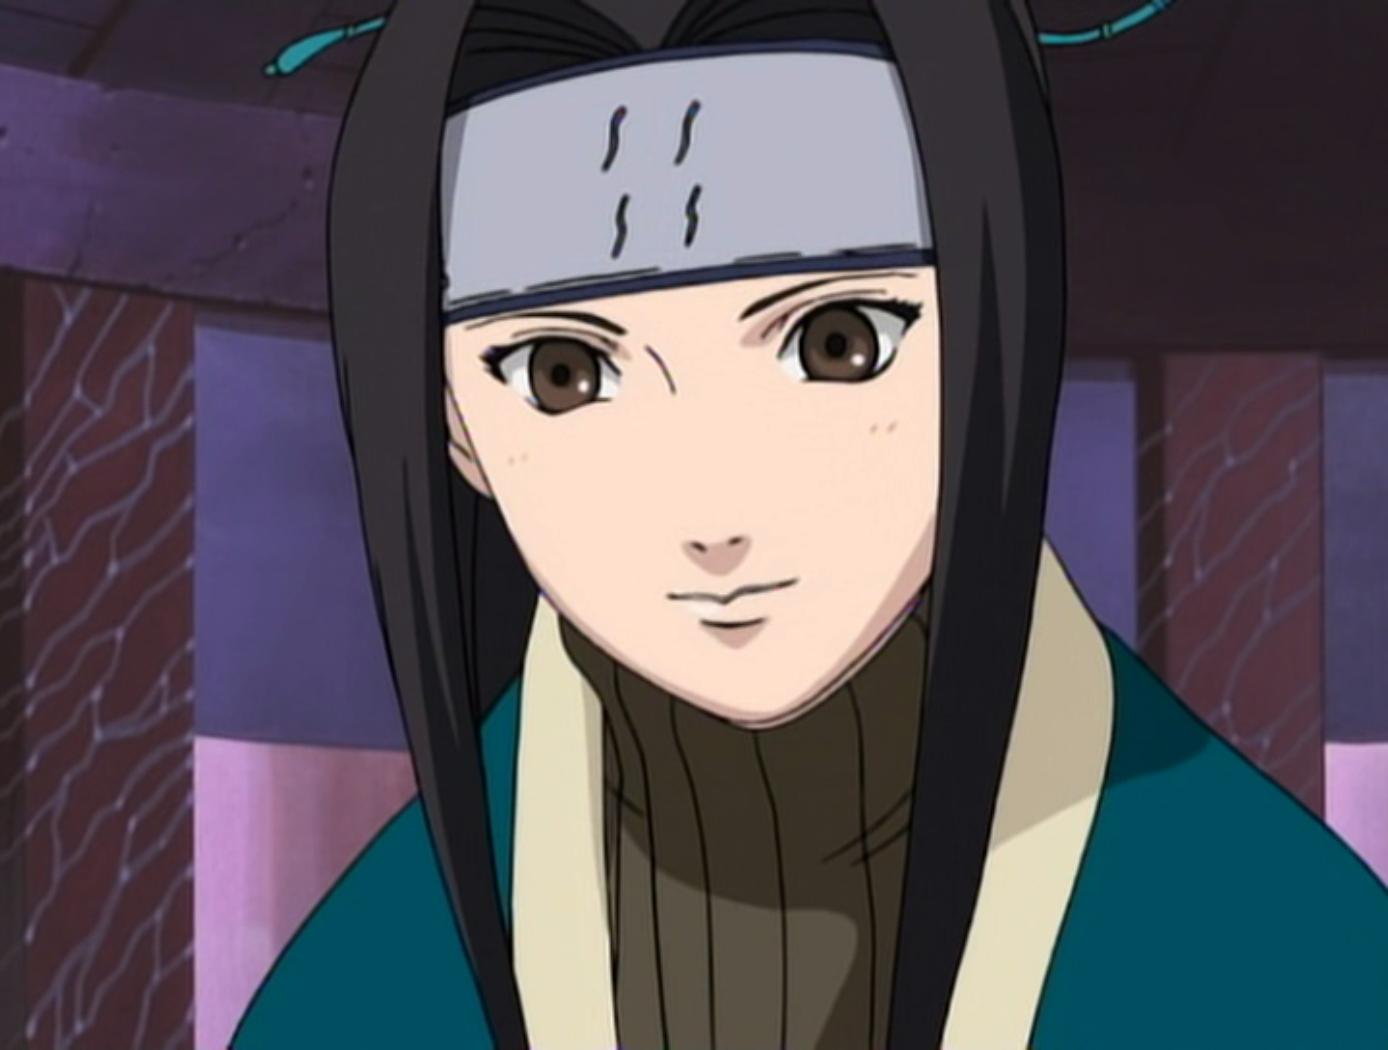 Haku Narutopedia Fandom The best gifs are on giphy. haku narutopedia fandom